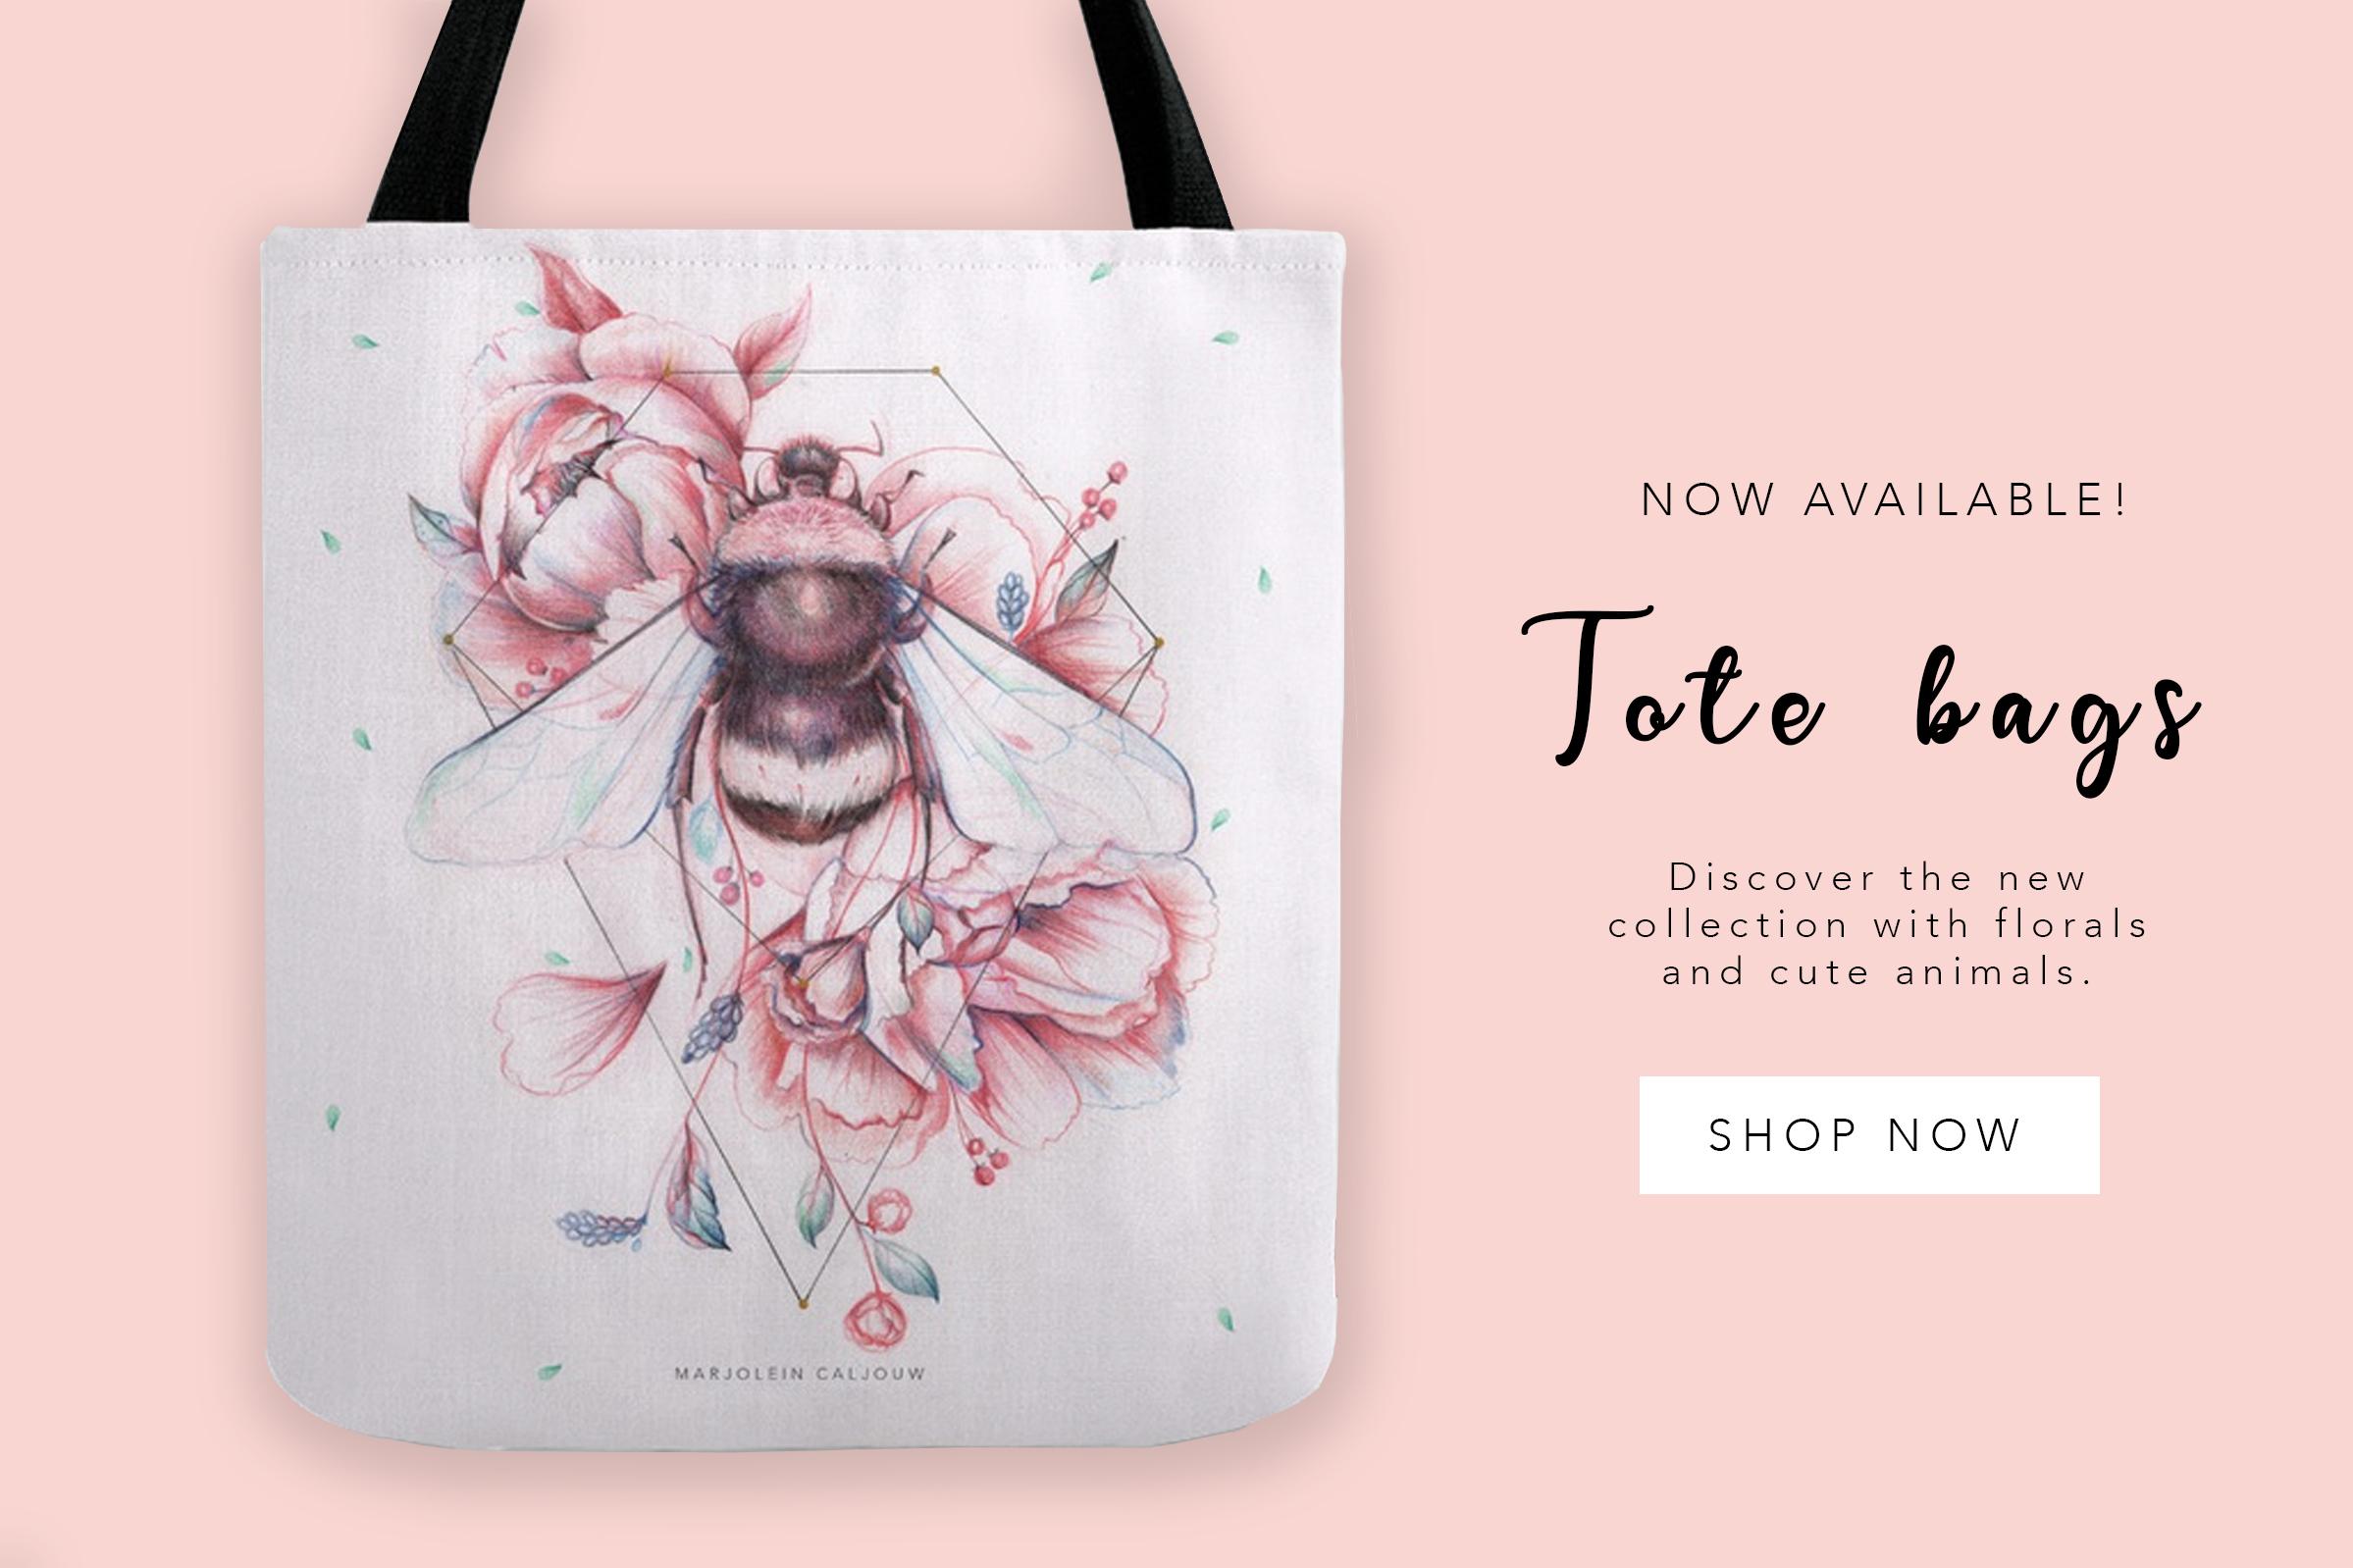 New_totebags_banner.jpg